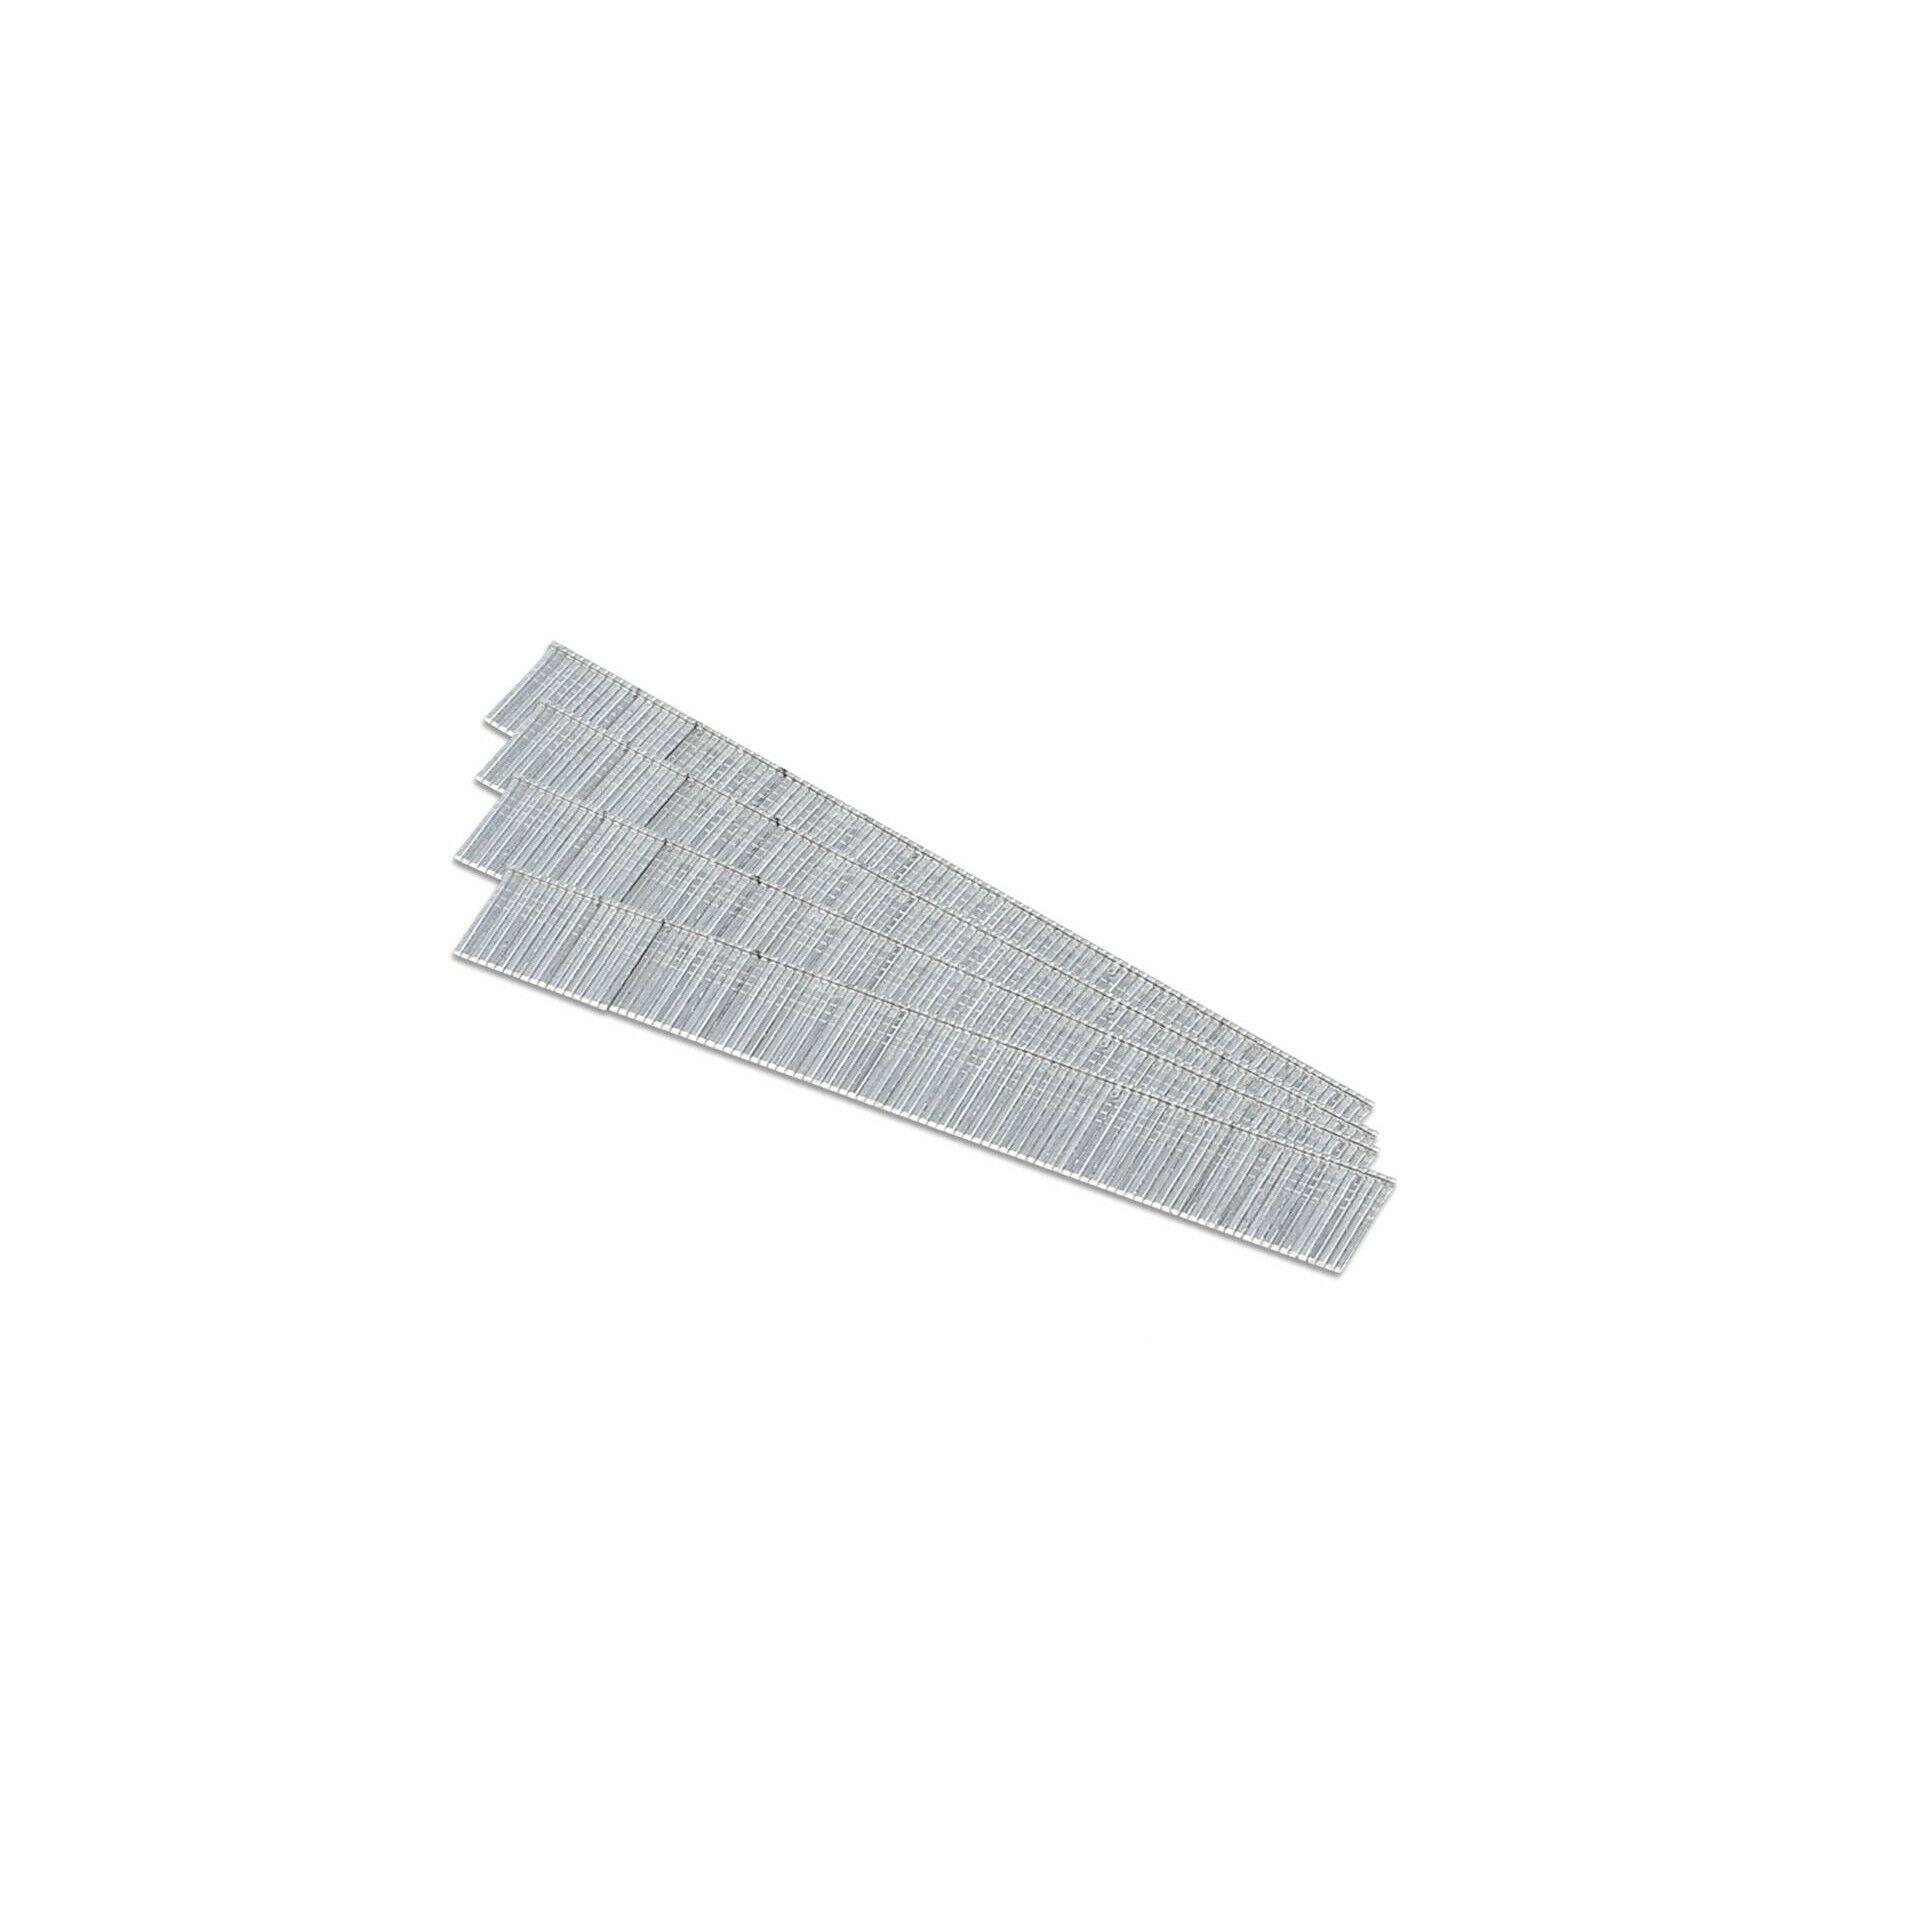 1000 Spijkers 40 mm | Stalen nagels voor nagelapparaat Powerplus POWAIR0311